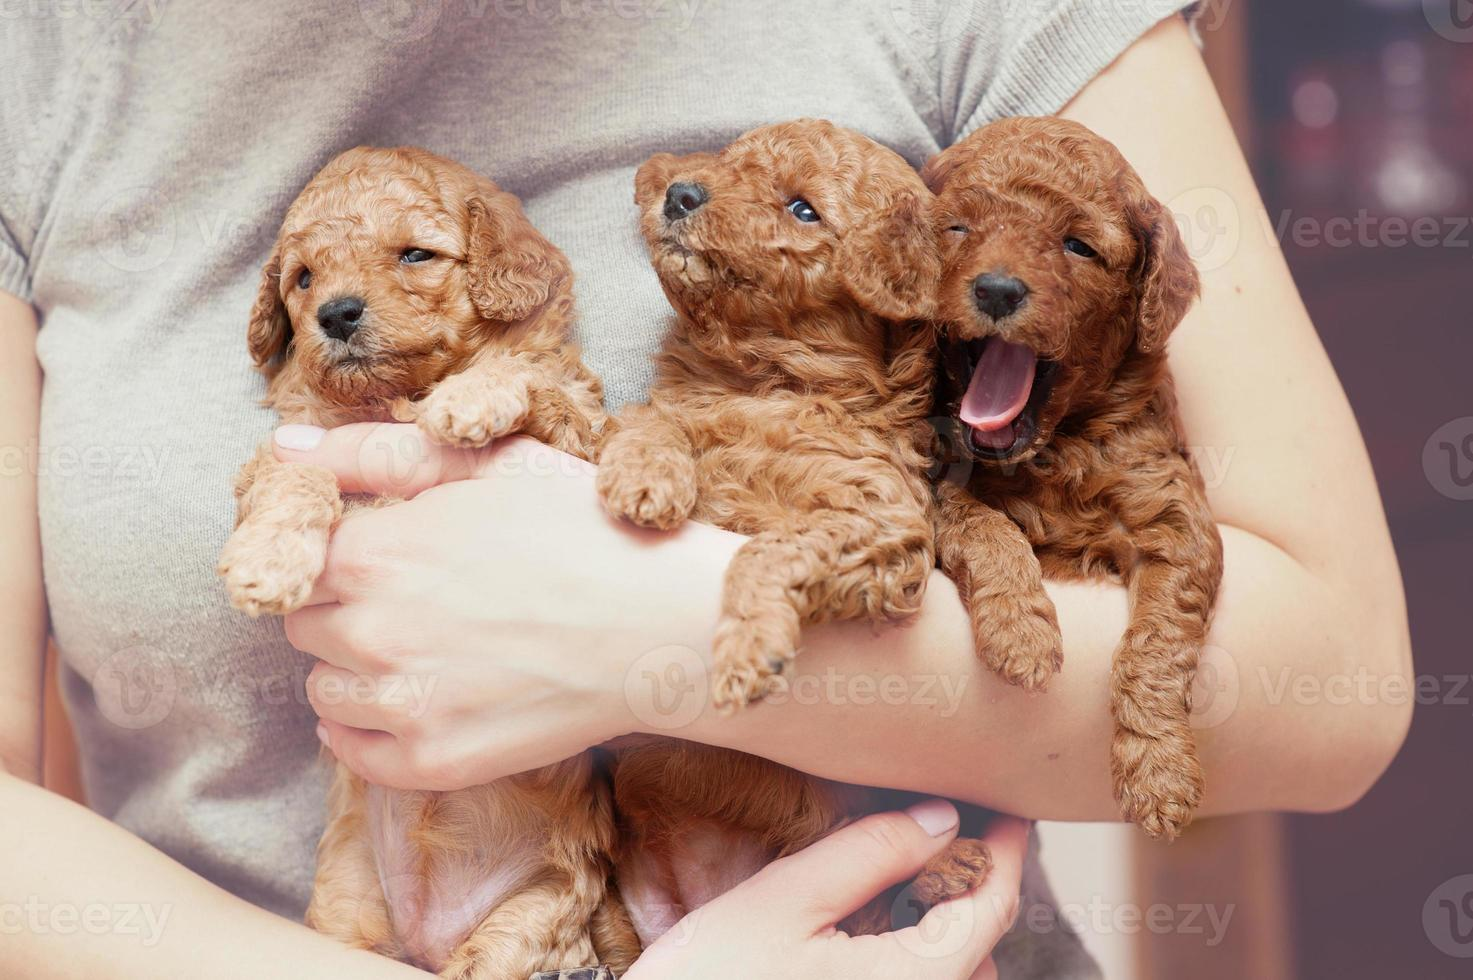 cachorros de caniche toy foto